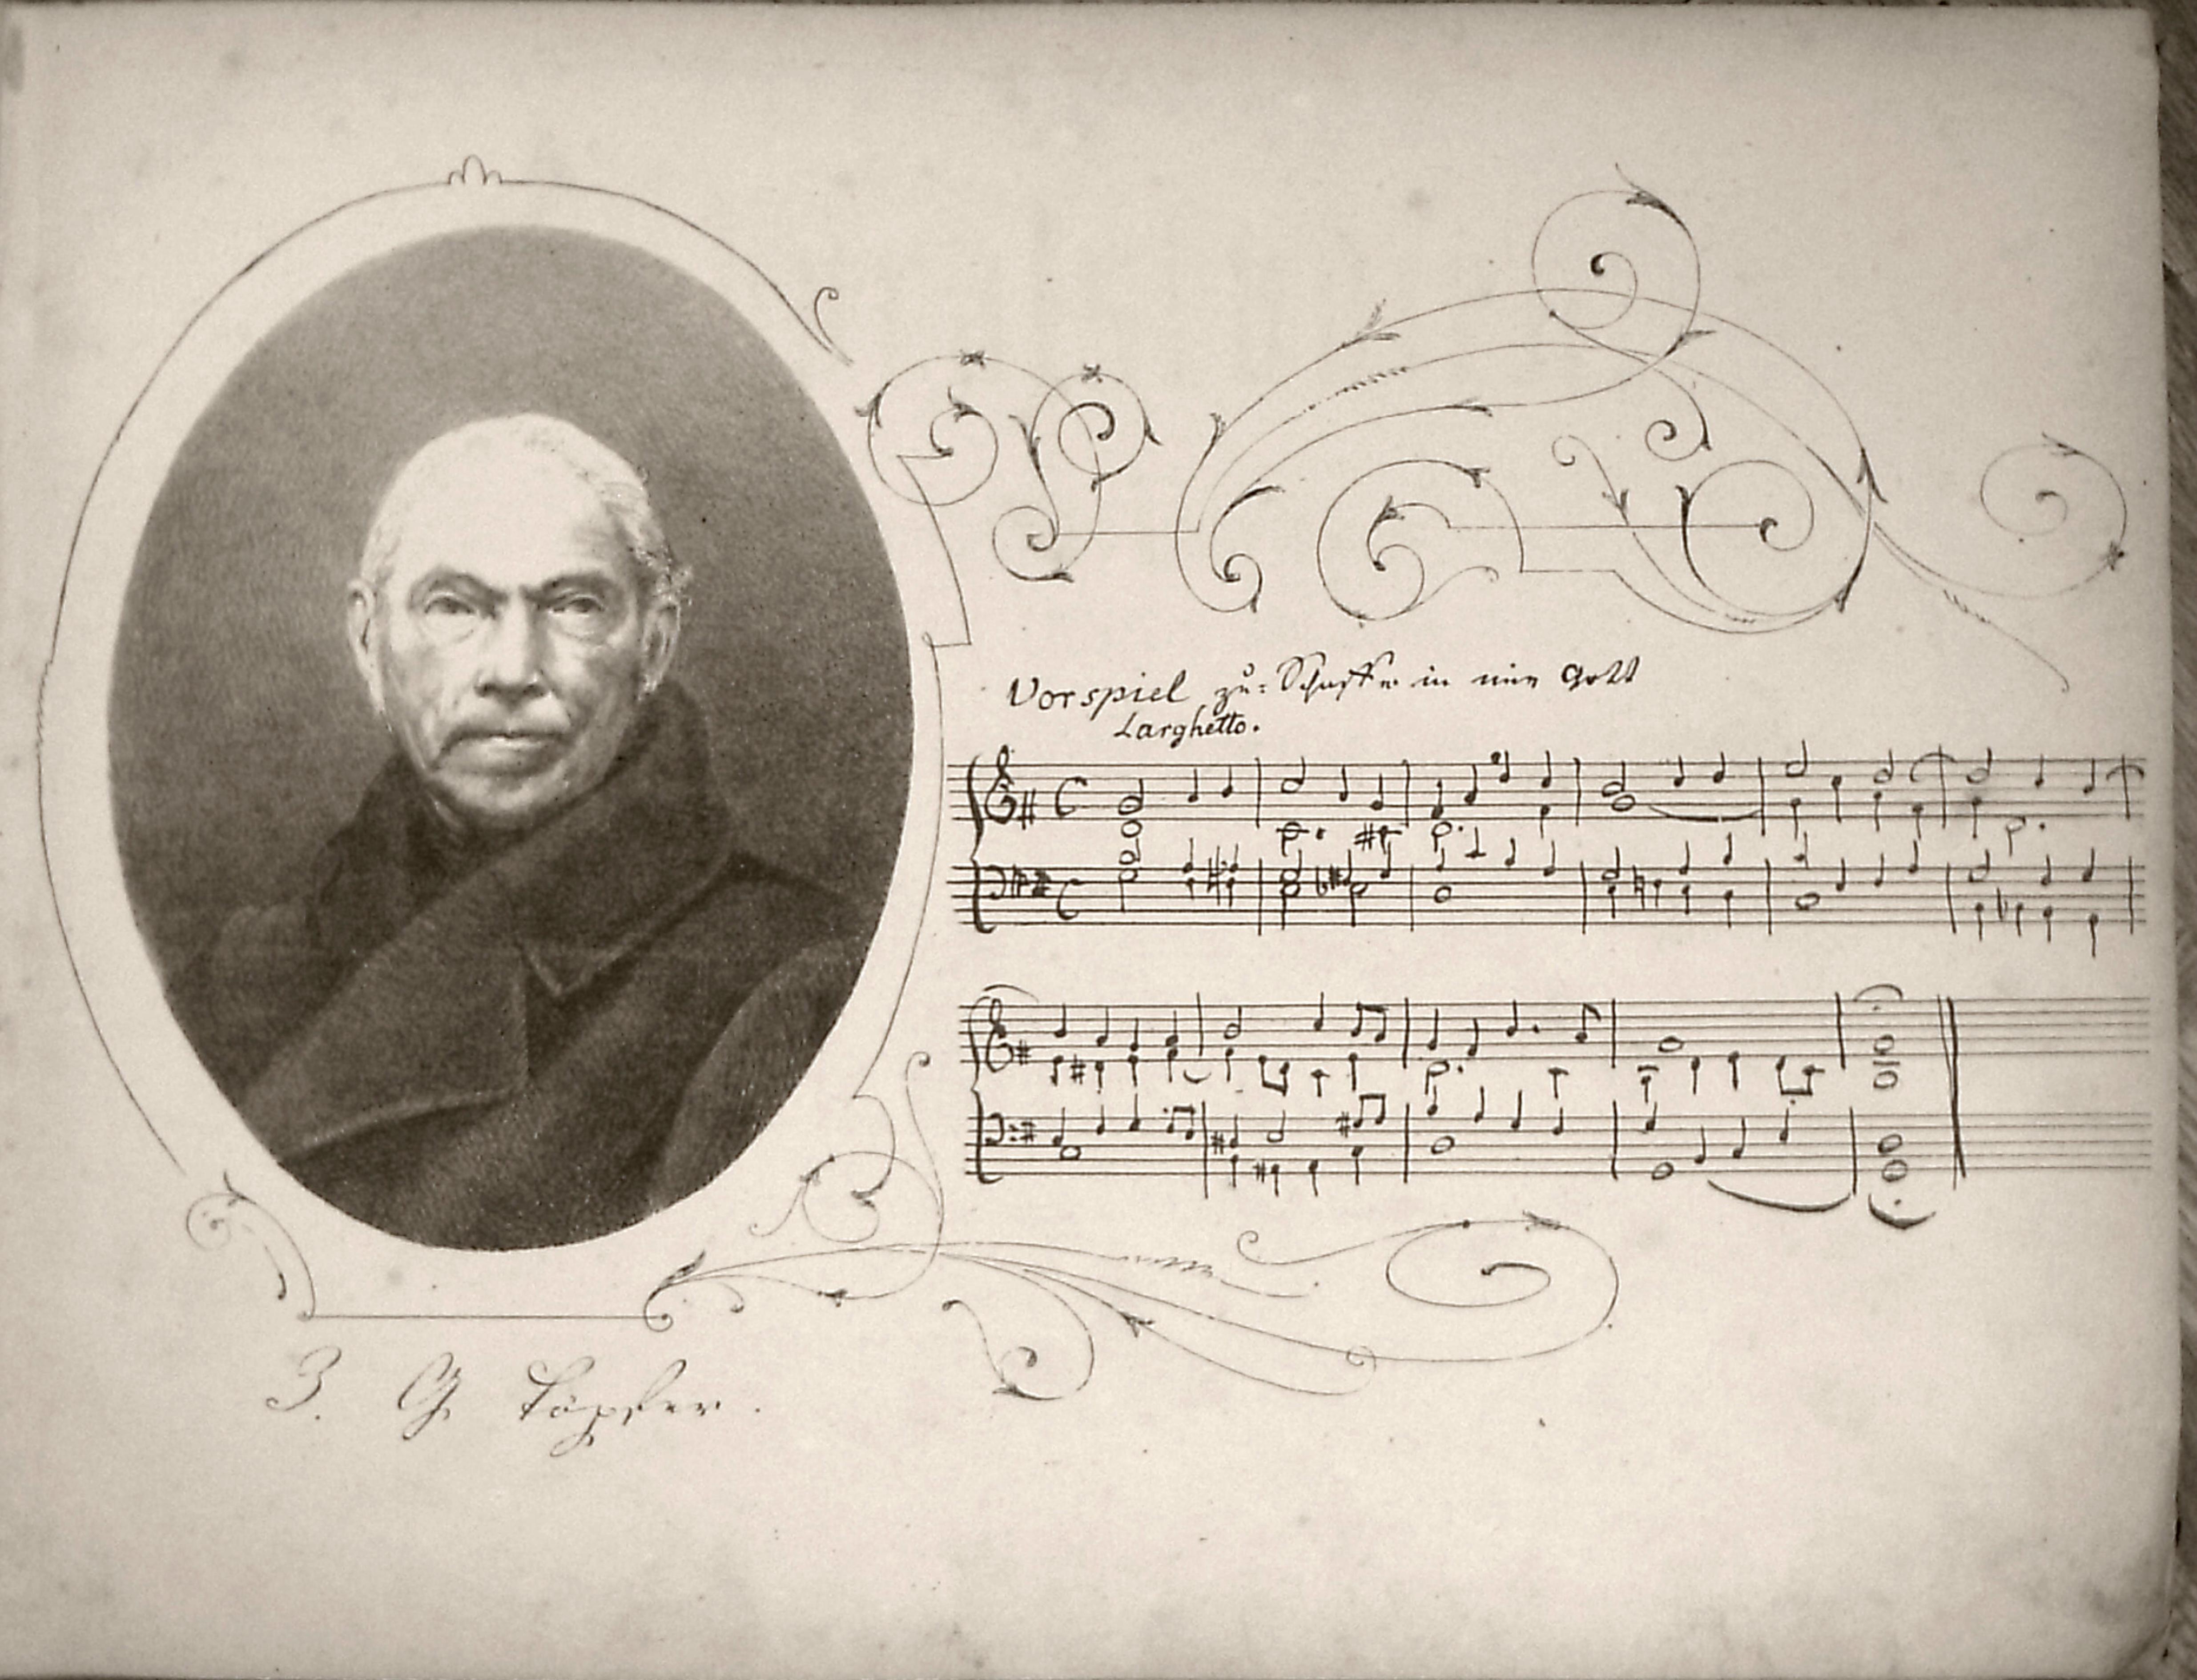 Titlepage of Choralstudien 1873